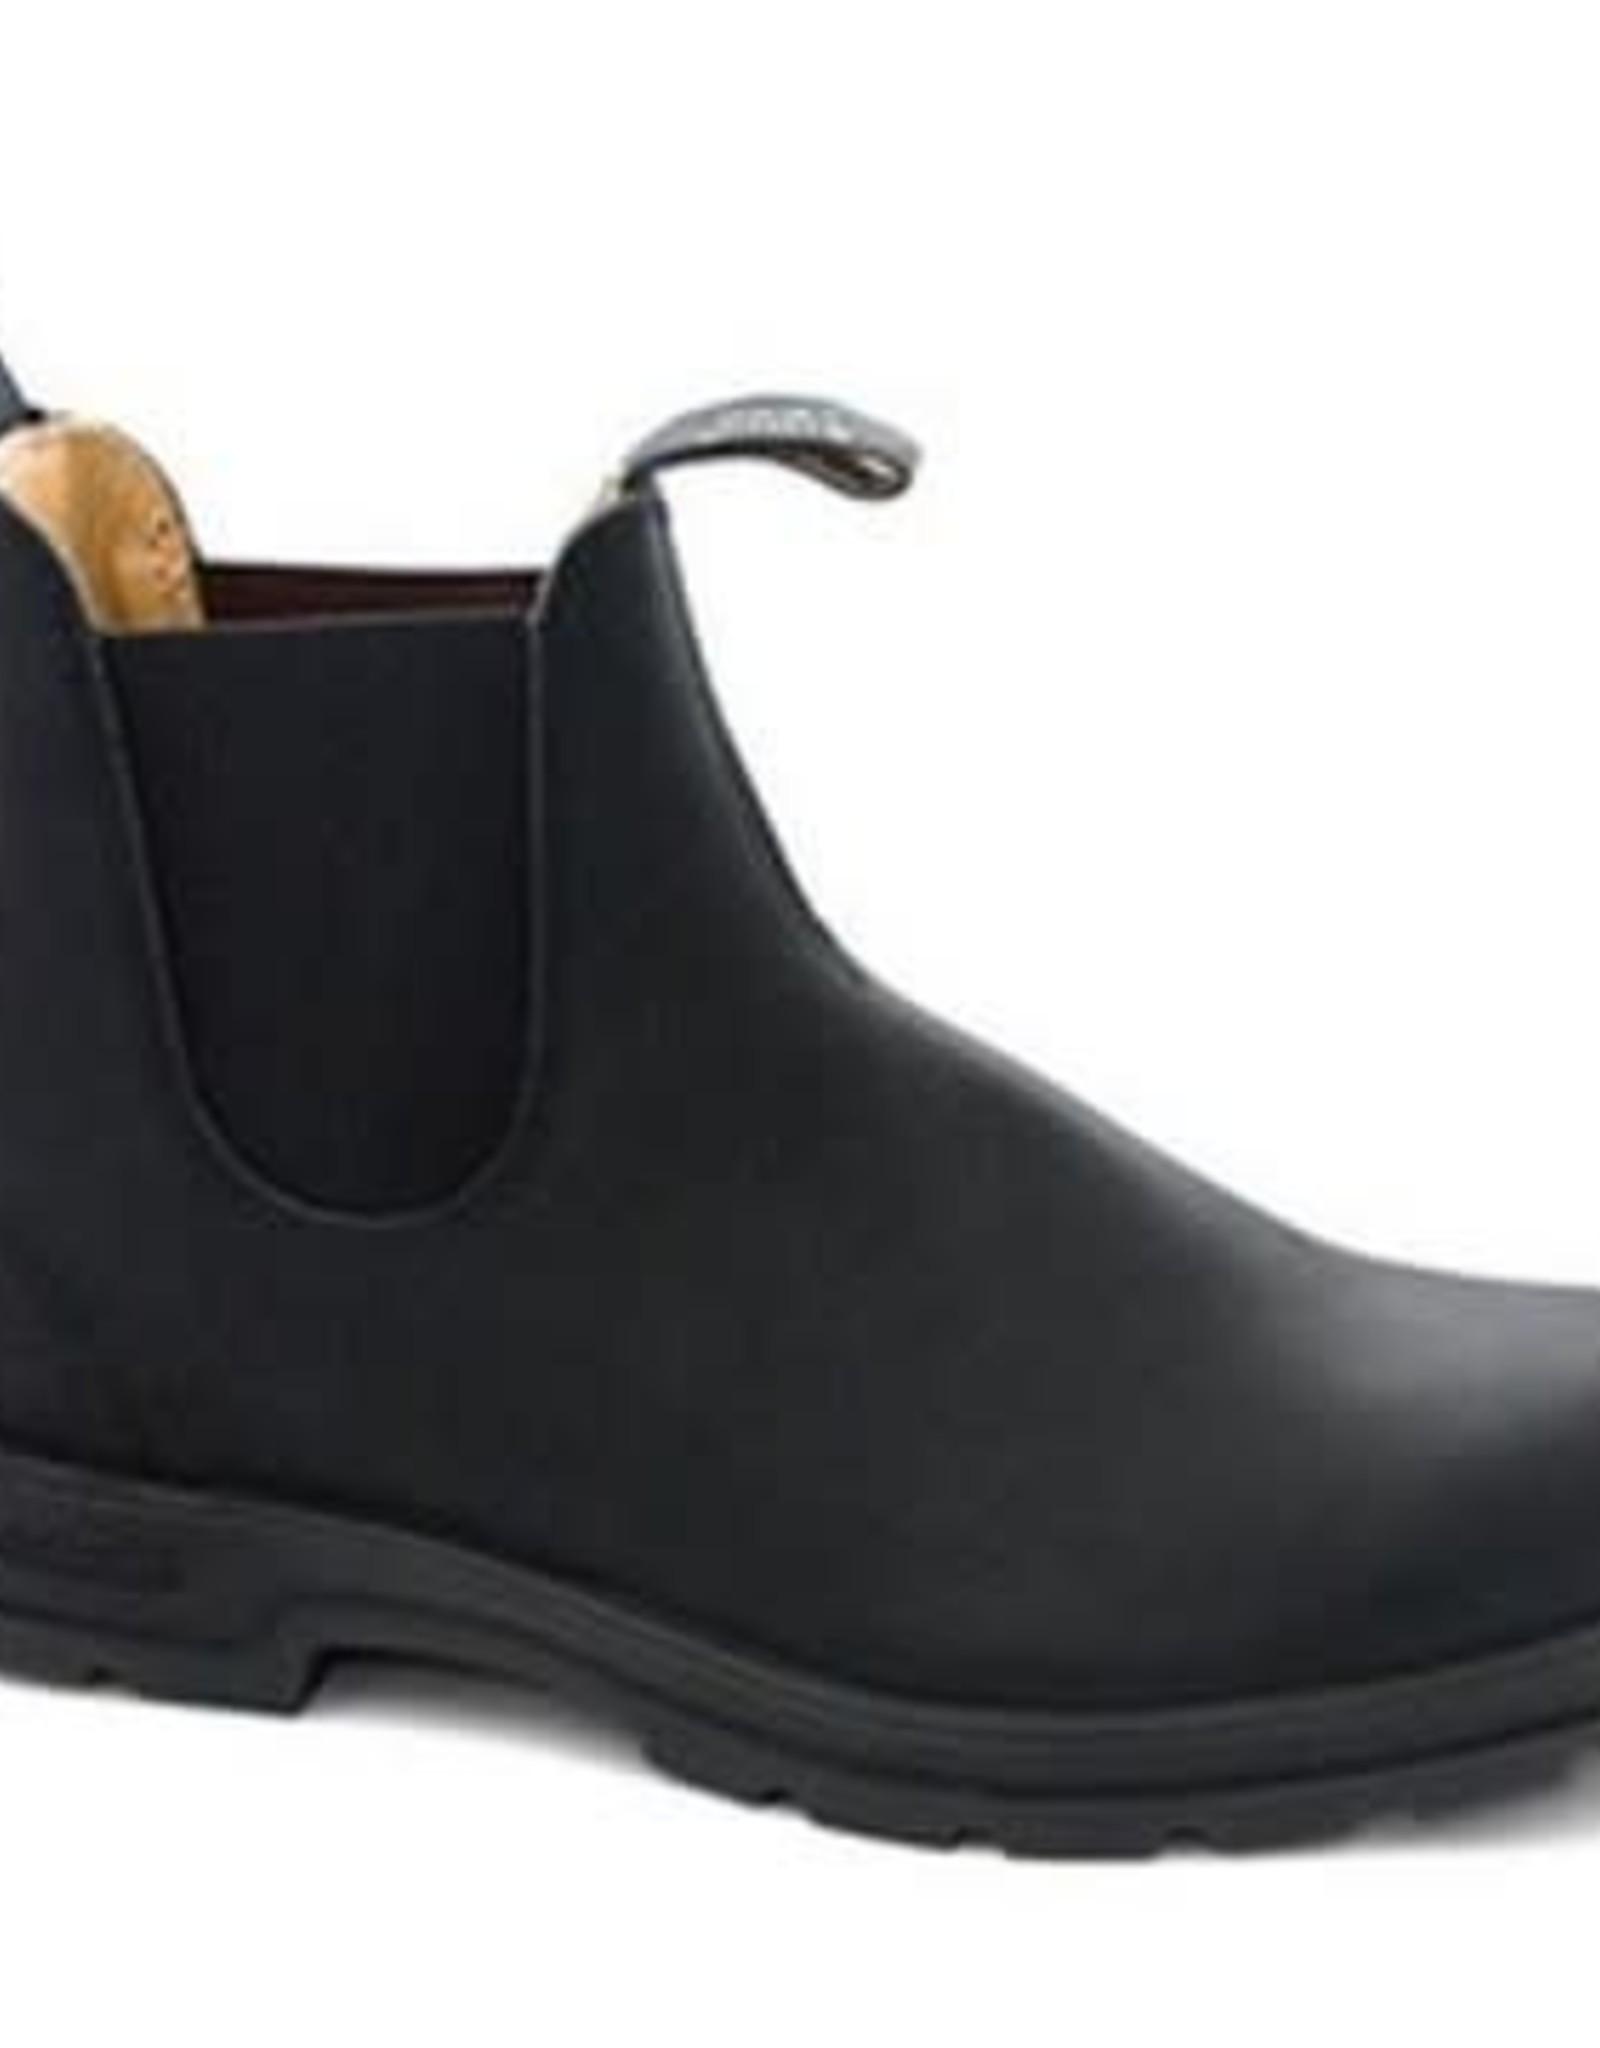 Blundstone Blundstone, 558 Leather Lined Black , 1WIDTH, 9